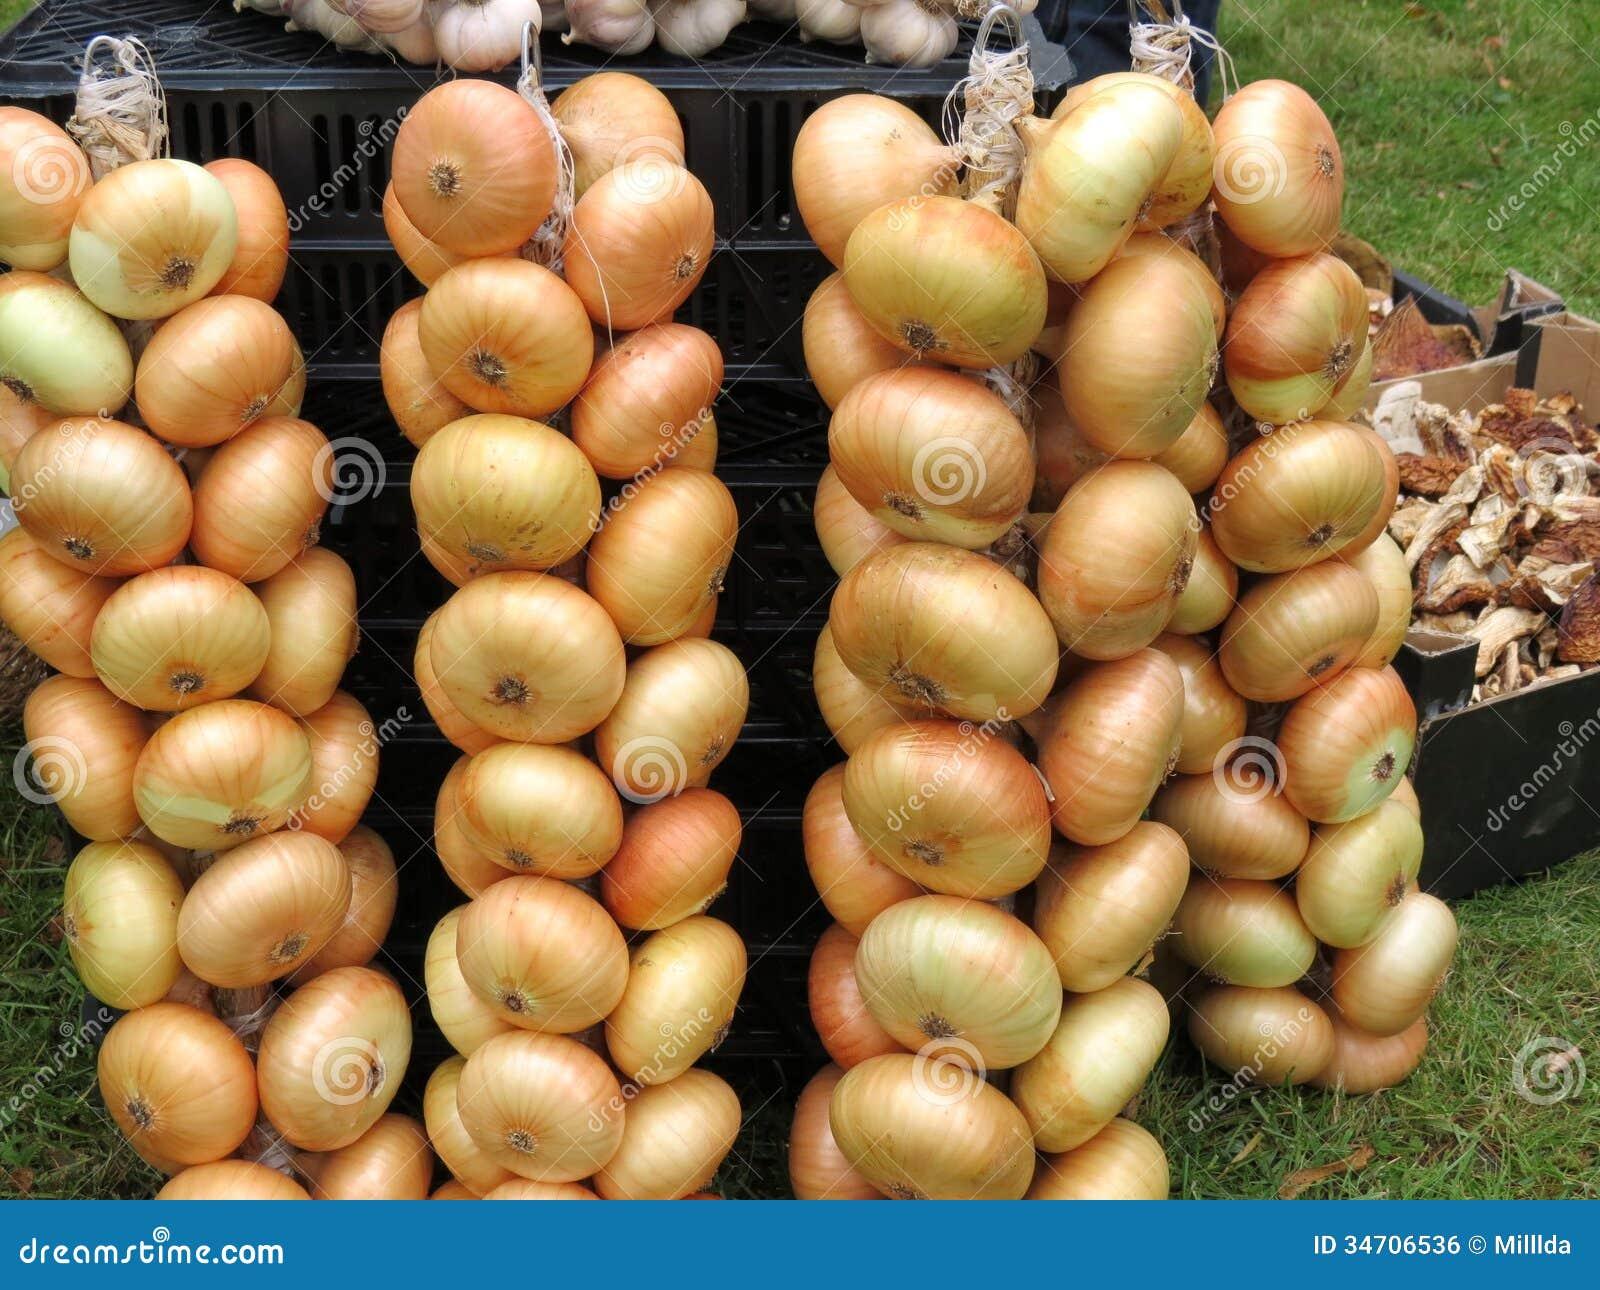 Onion String Royalty Free Stock Image - Image: 34706536